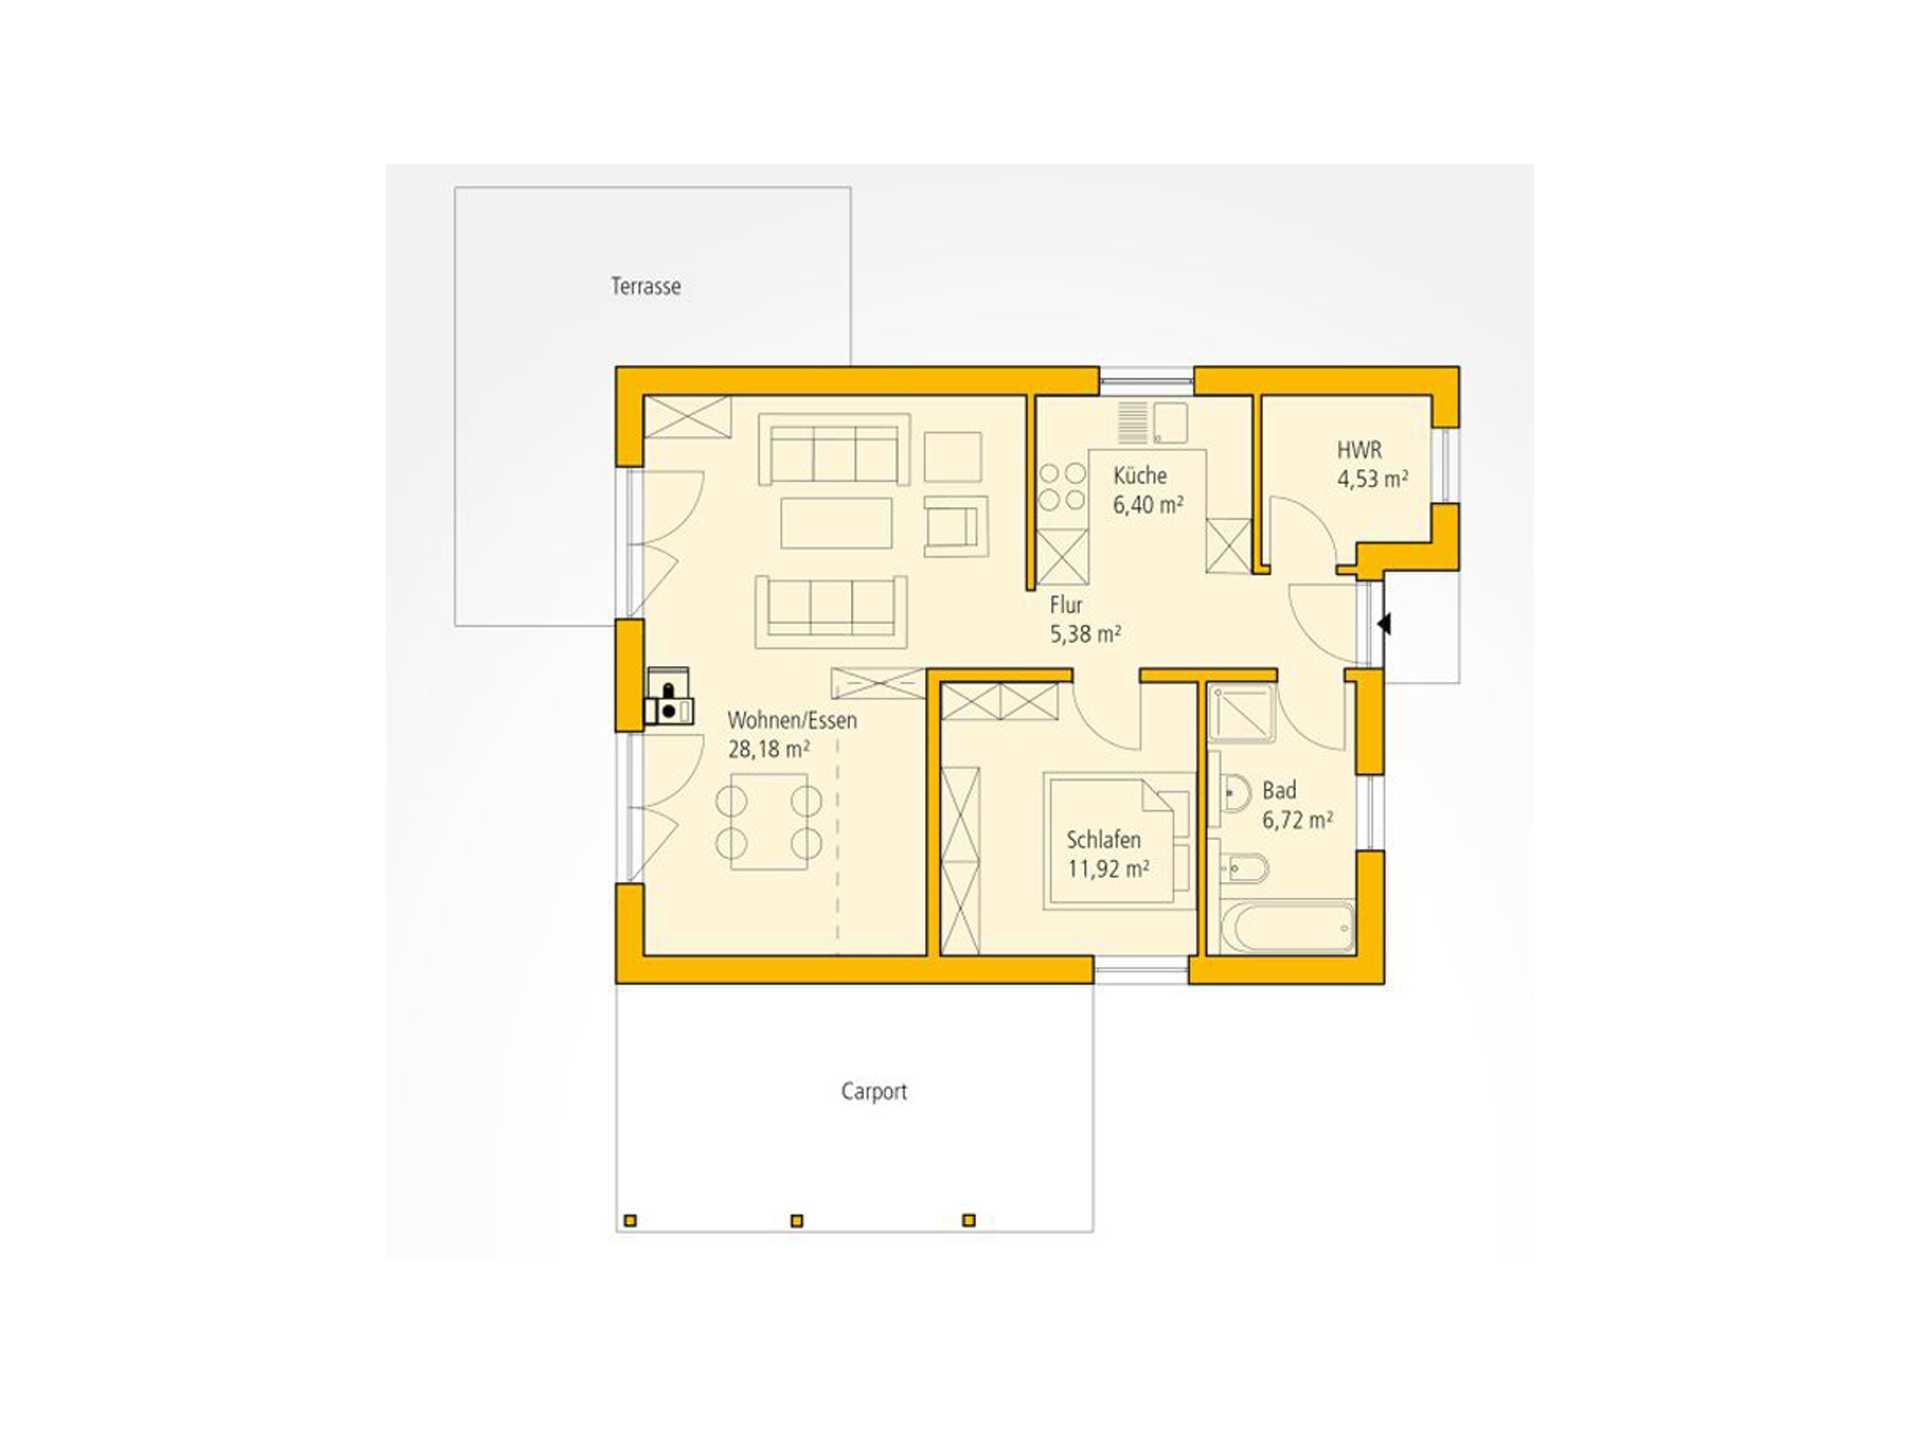 Bungalow A 69 Grundriss EG von Ytong Bausatzhaus